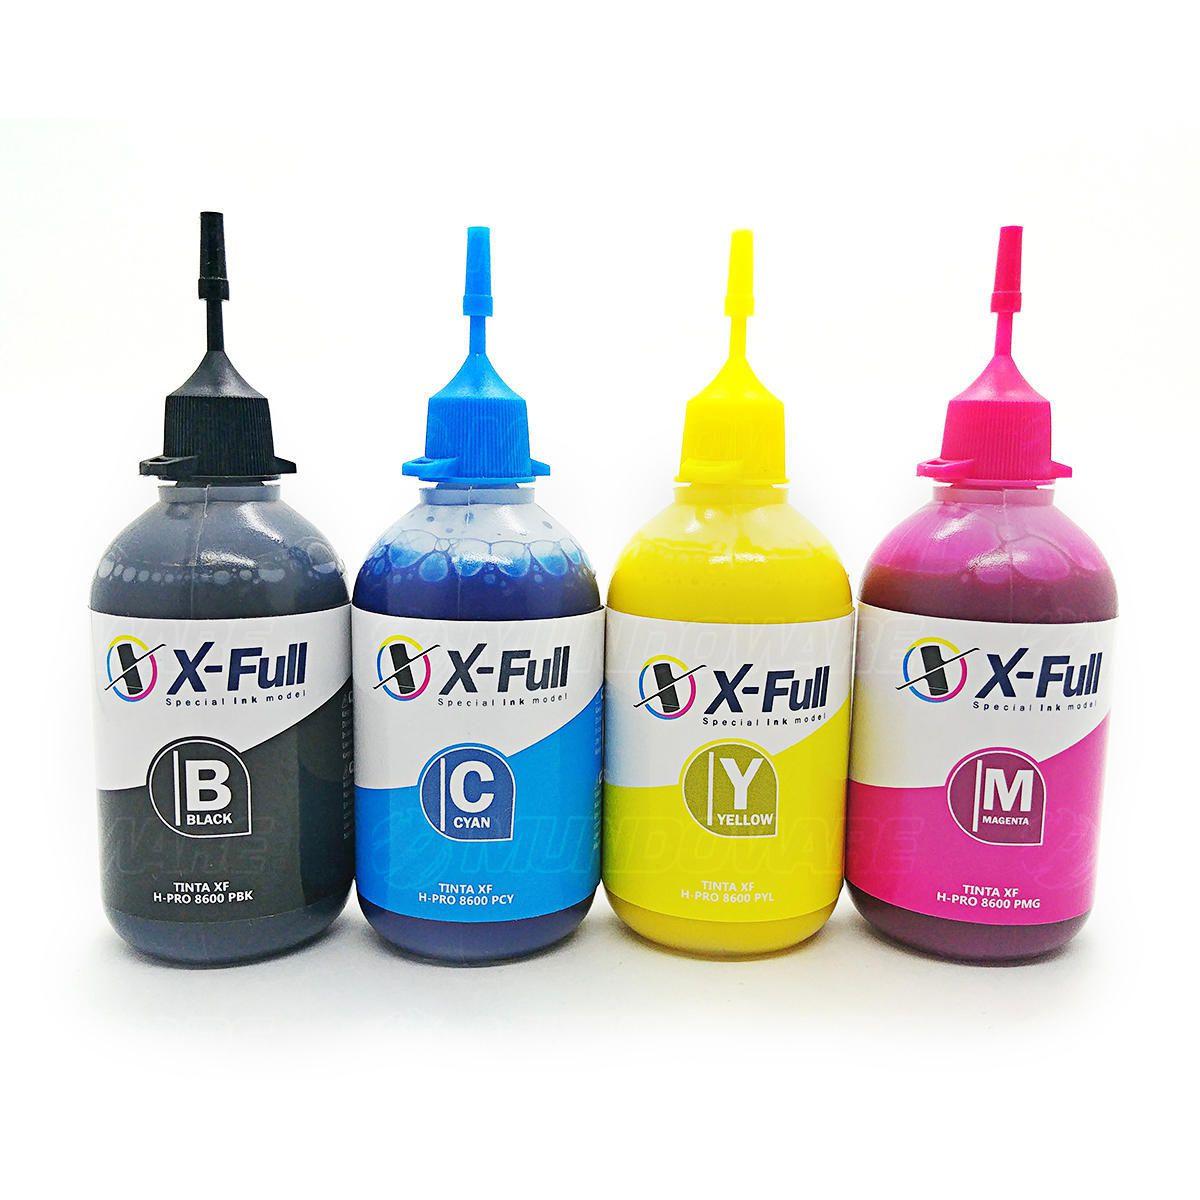 Compatível: Kit Colorido de Tinta Pigmentada X-Full para HP 8000 8100 8500 8600 X451dw X551dw X476dw X576dw / 4x100ml